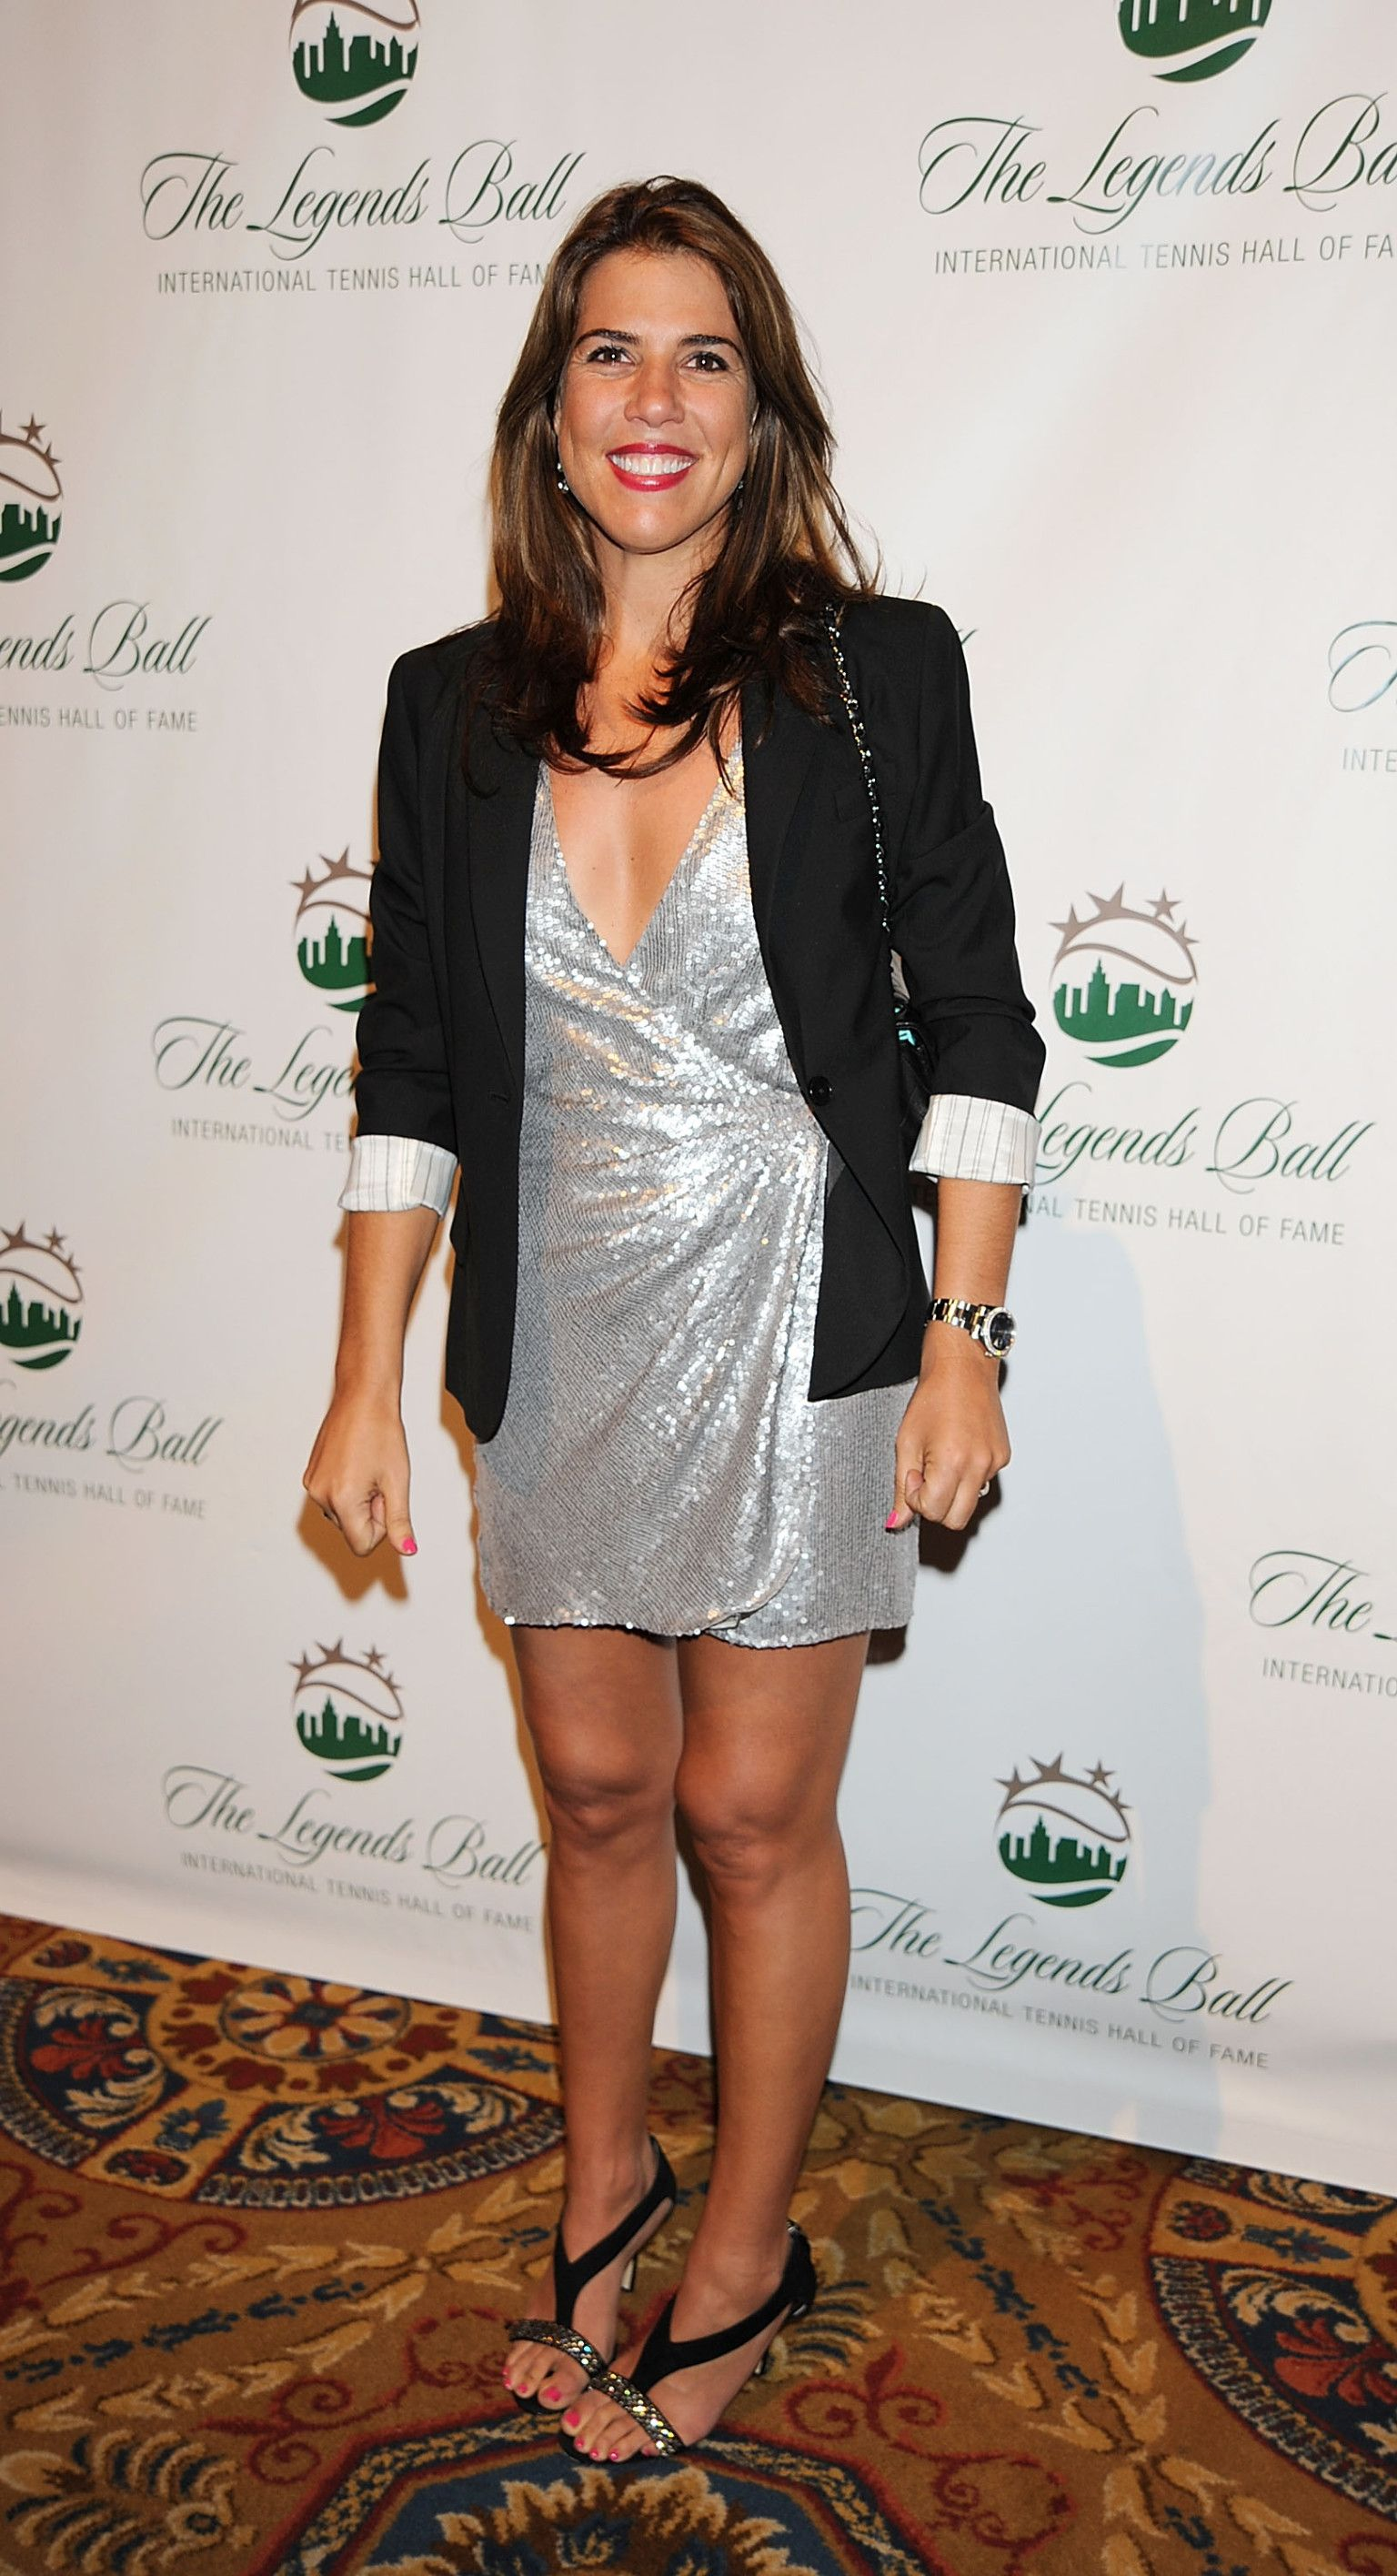 Jennifer Capriati Tennis Player Leaked Celebs